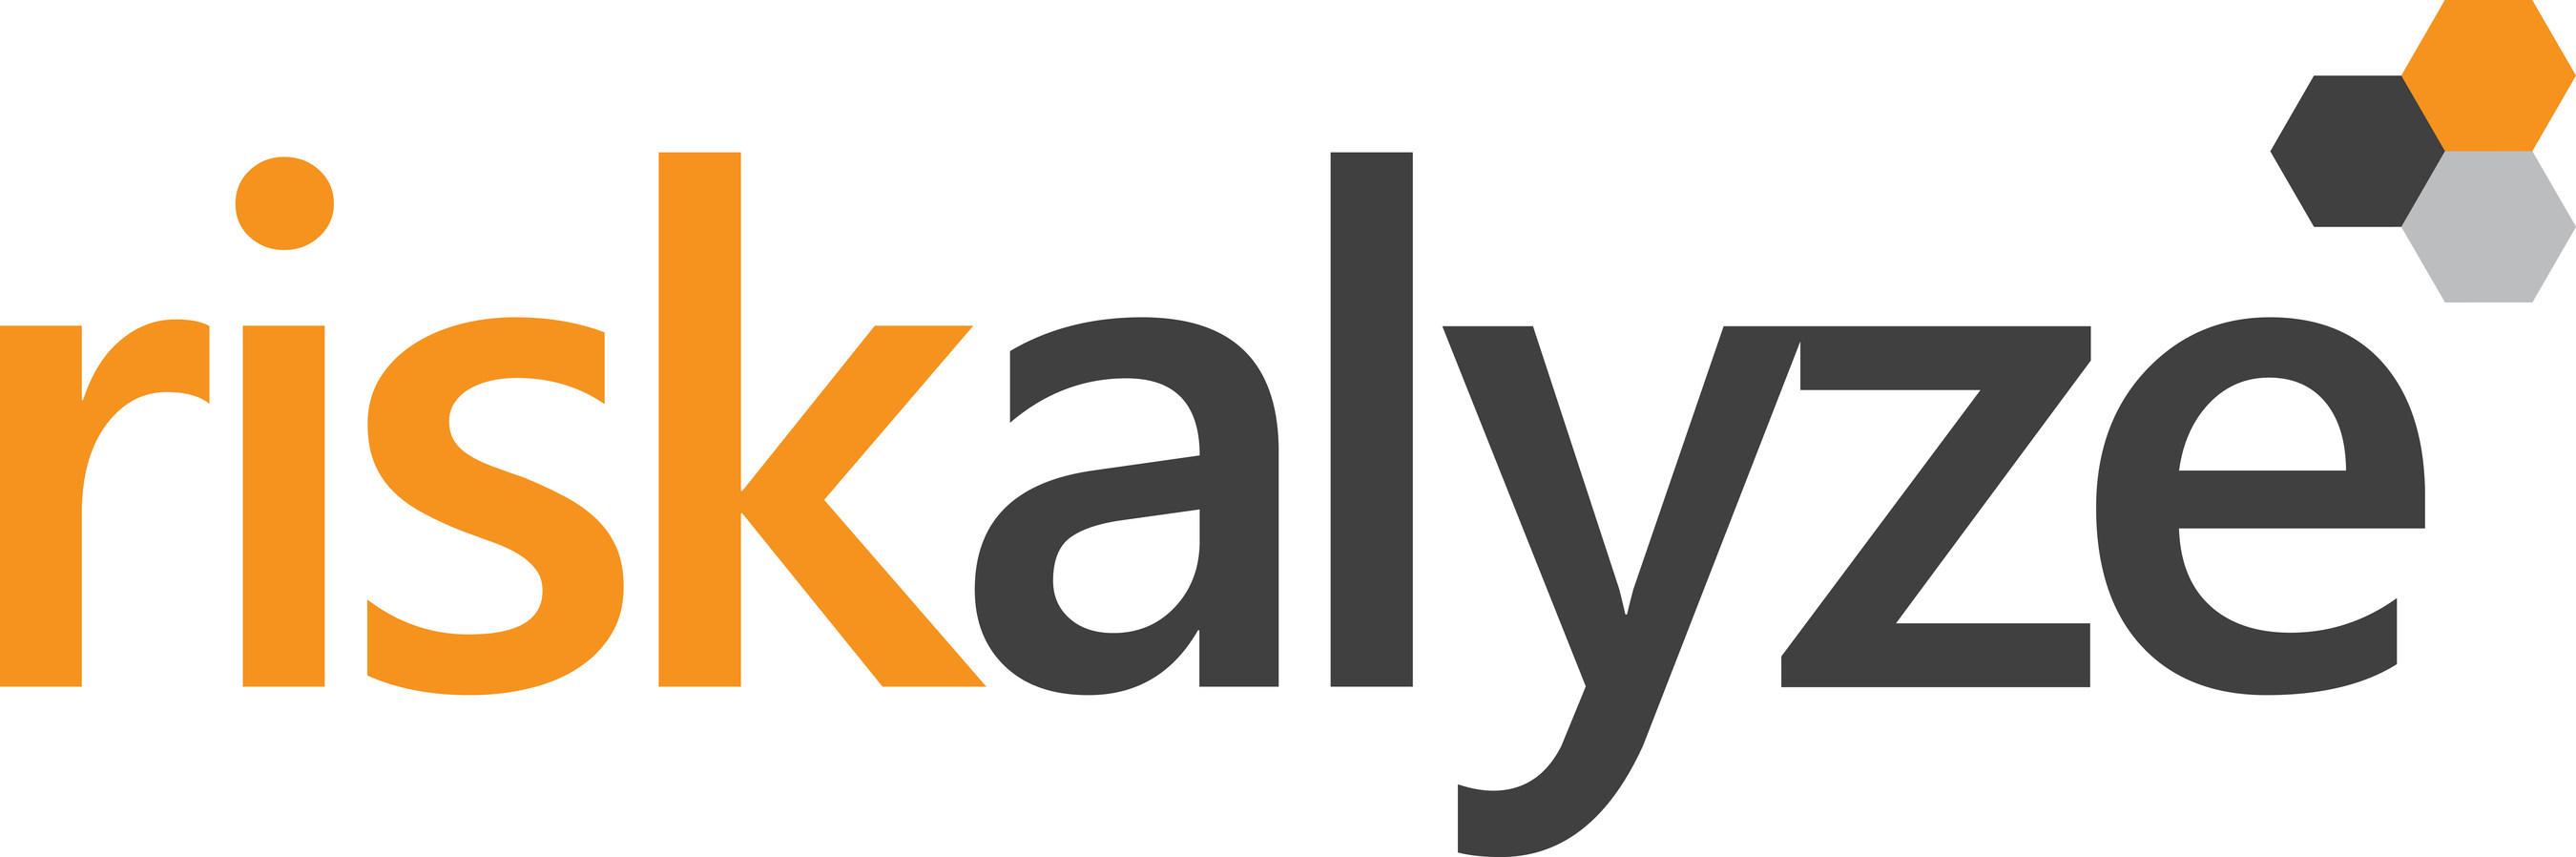 riskalyze announces the next generation autopilot platform prnewsfoto riskalyze